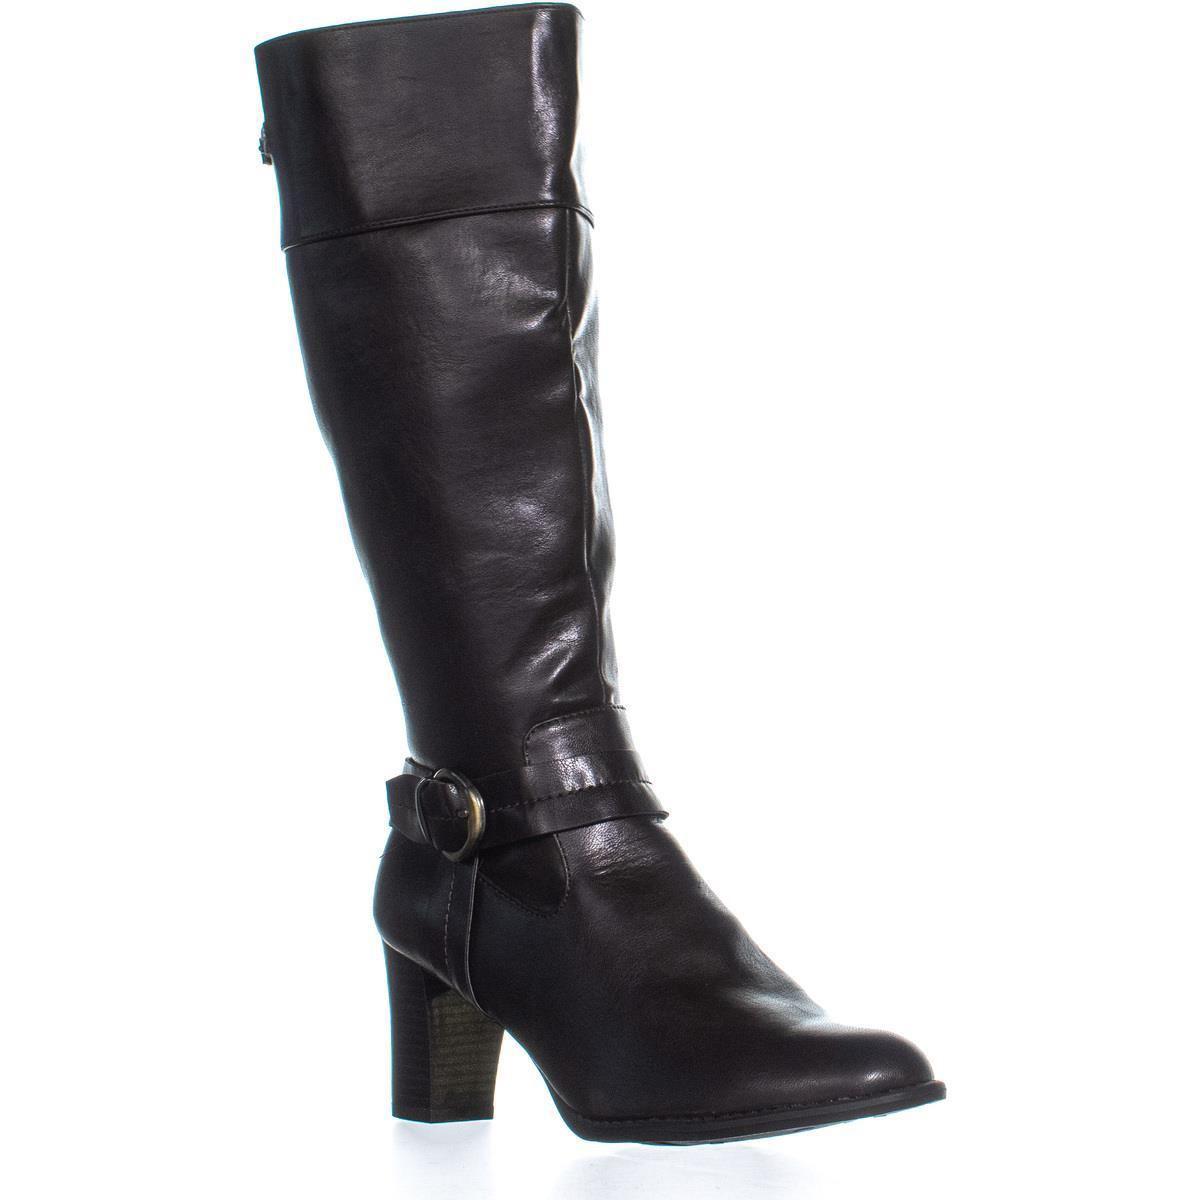 2deb909d3241 LifeStride. Women s Yana Knee High Heeled Boots